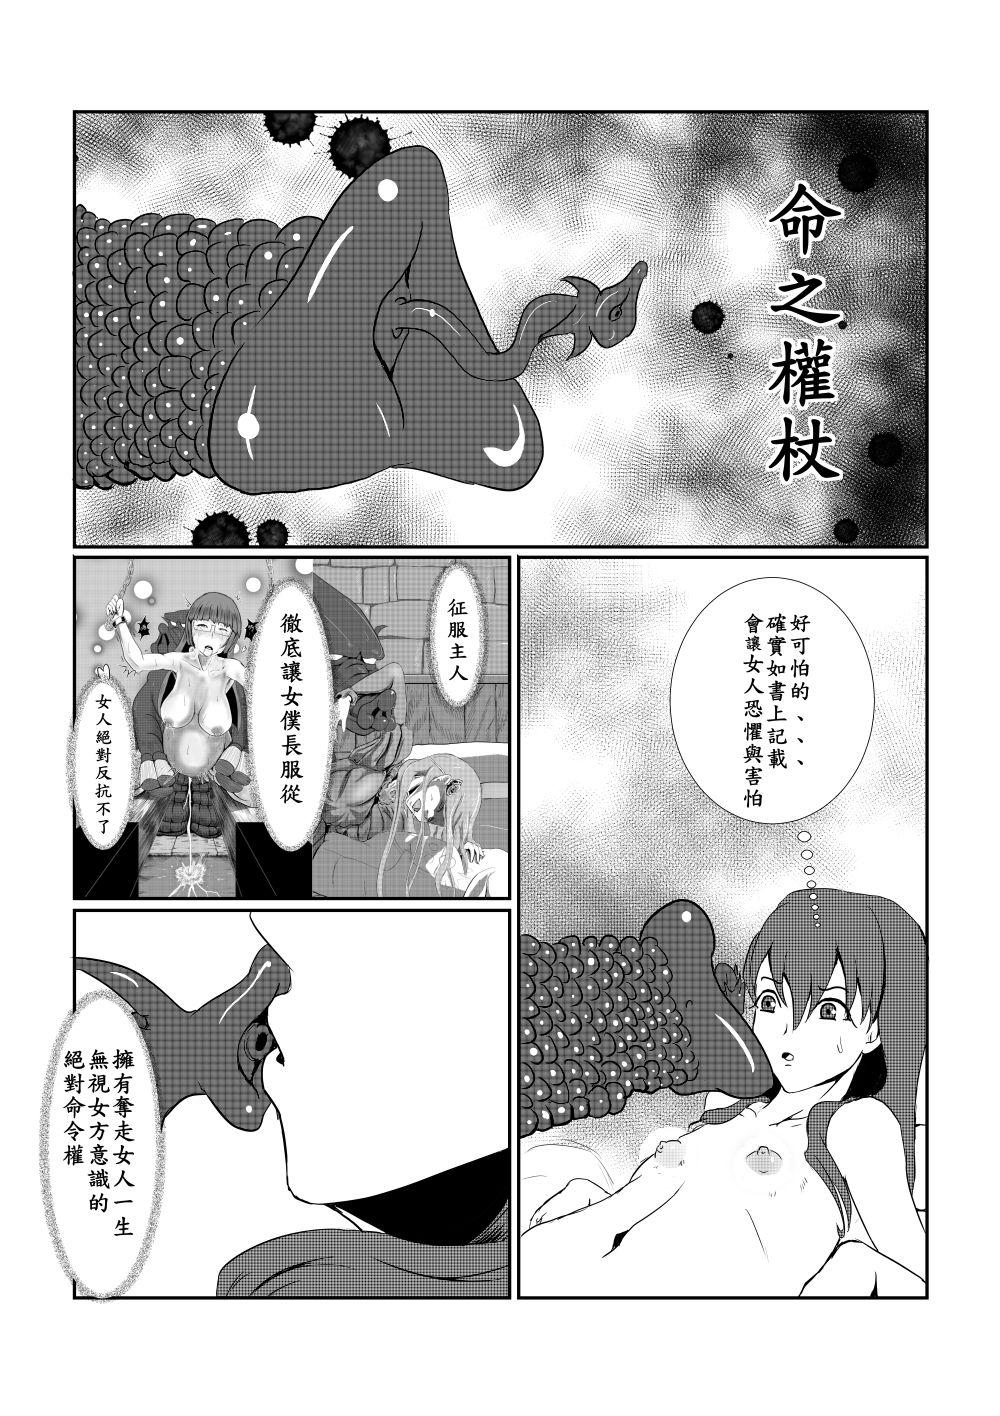 Maou Yuusha - Kachiku Kiki 3 122